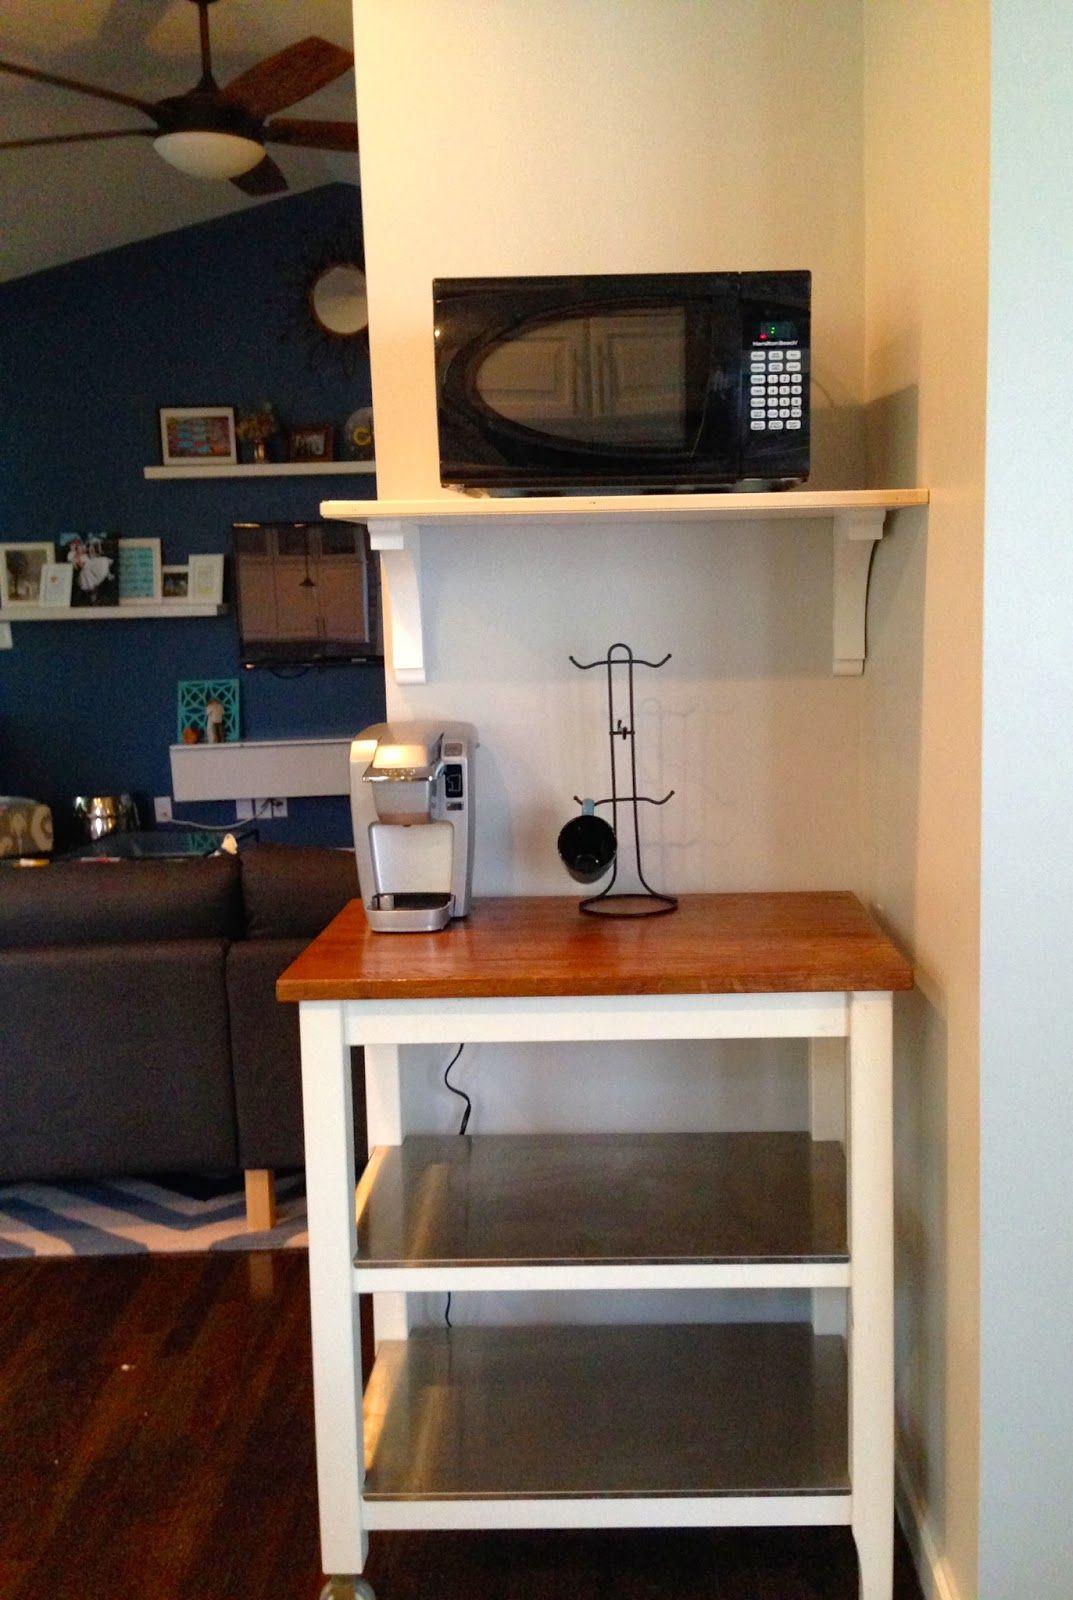 diy wood wall mounted microwave shelf